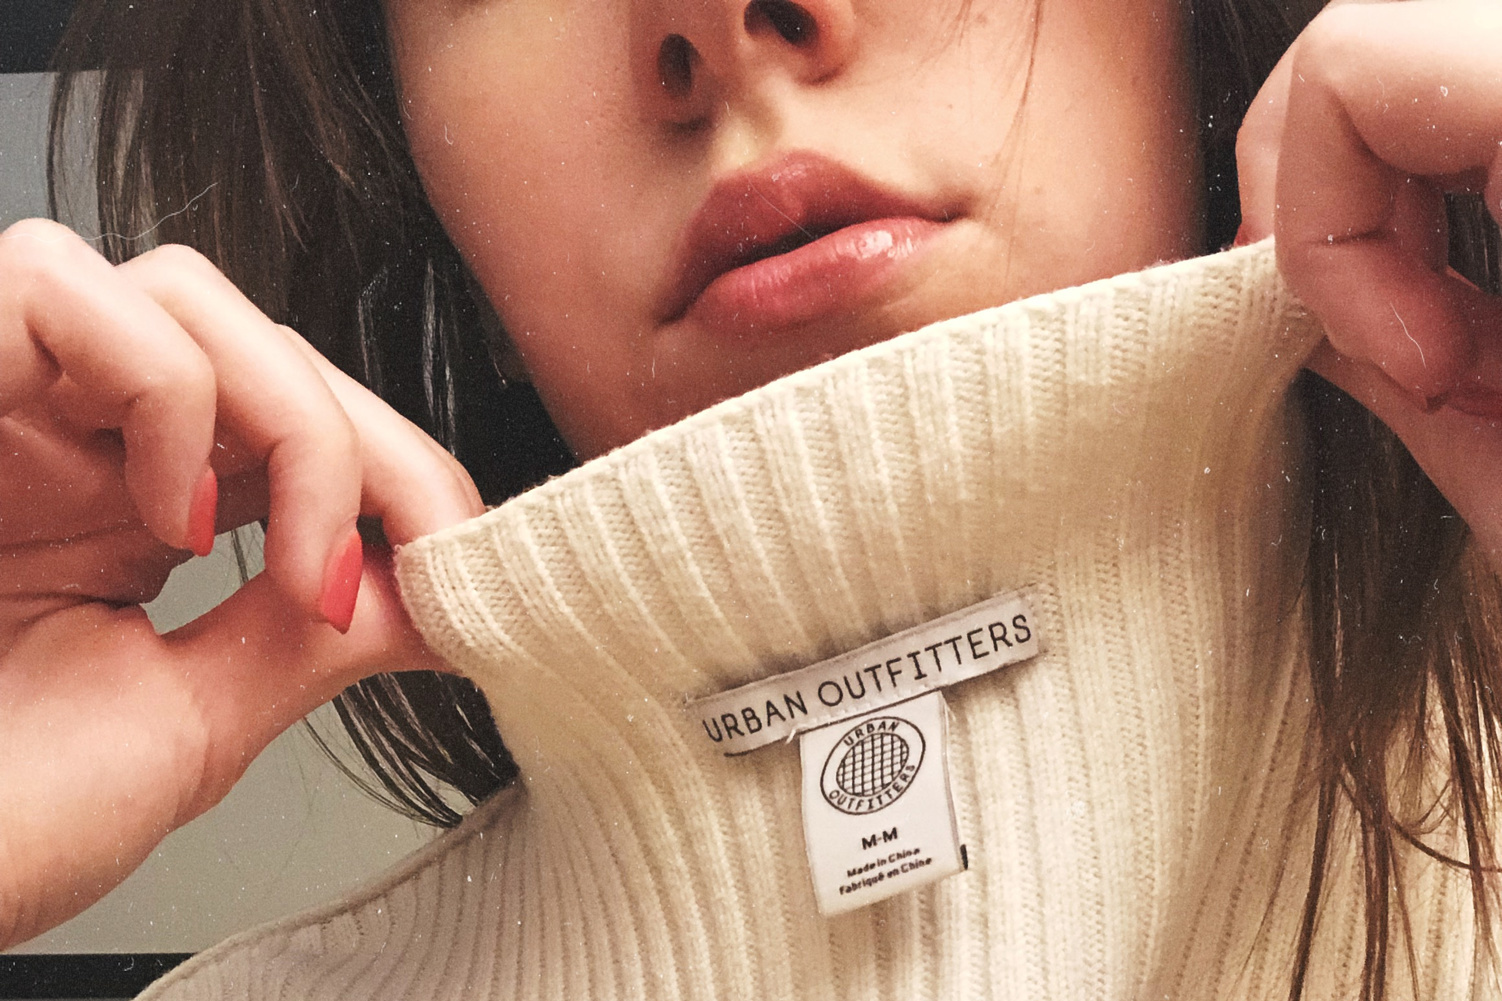 Deel een selfie met je kledinglabel en stel vragen aan het modemerk, Carly Ives/Inside Out